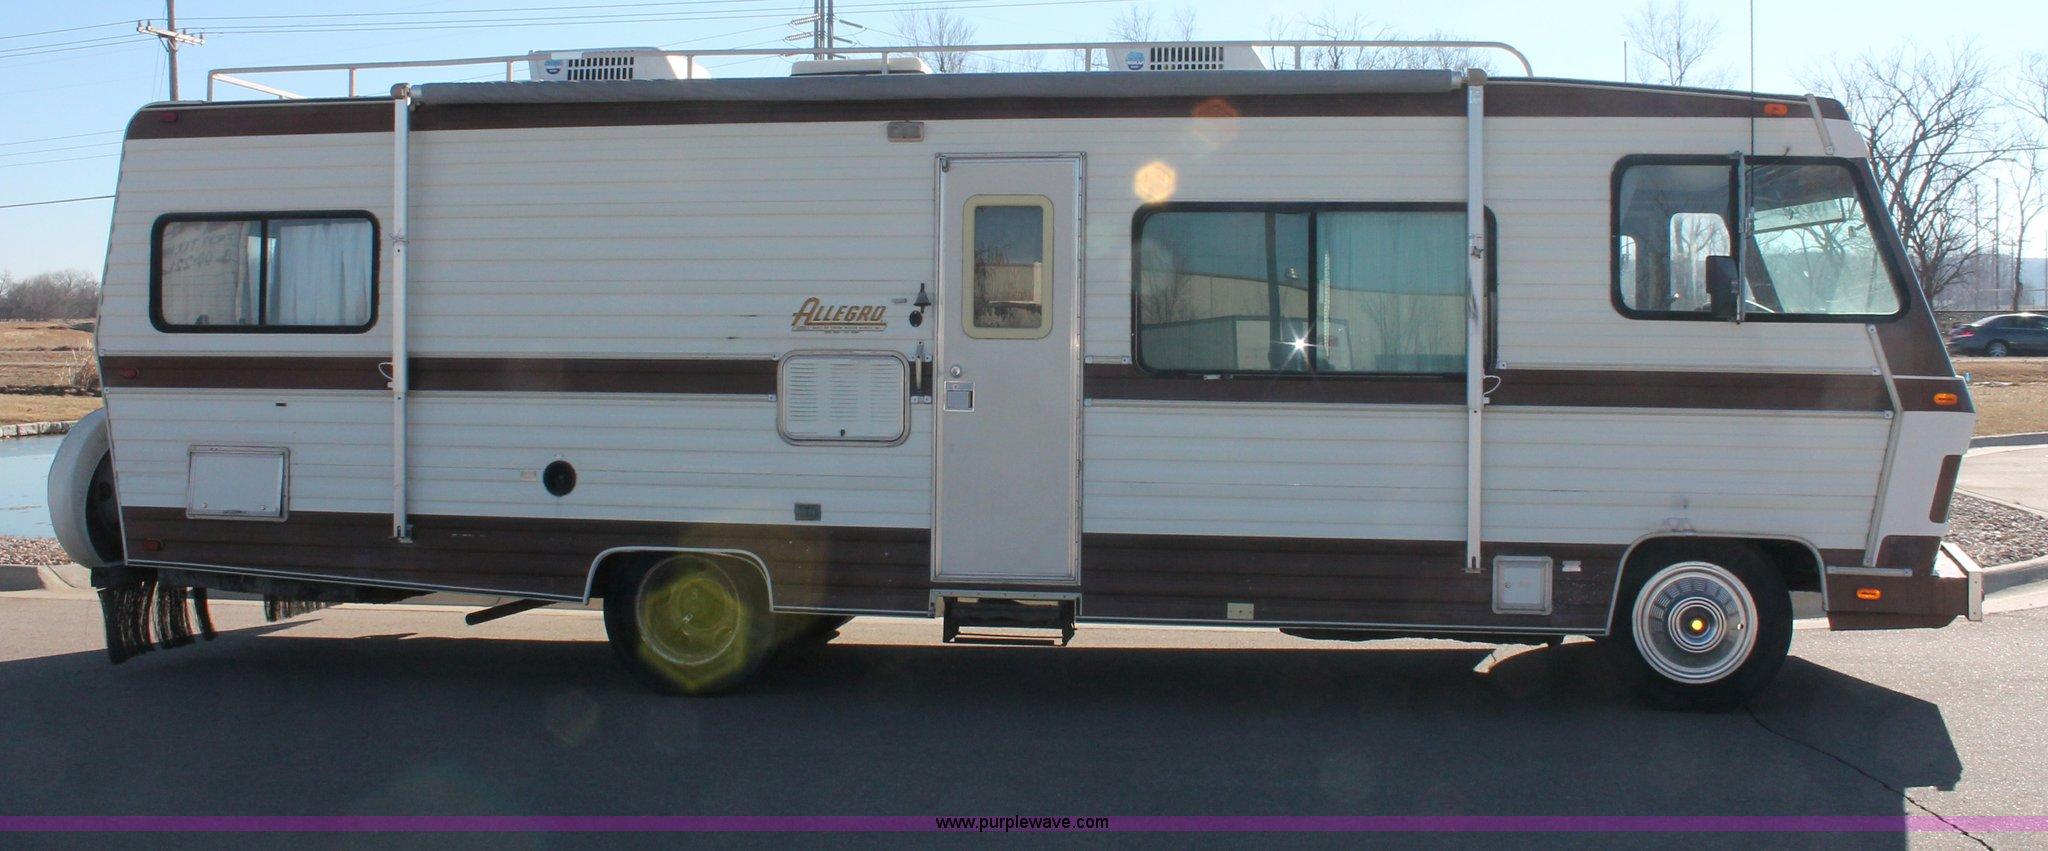 1984 Chevrolet Allegro Tiffin recreational vehicle   Item E2